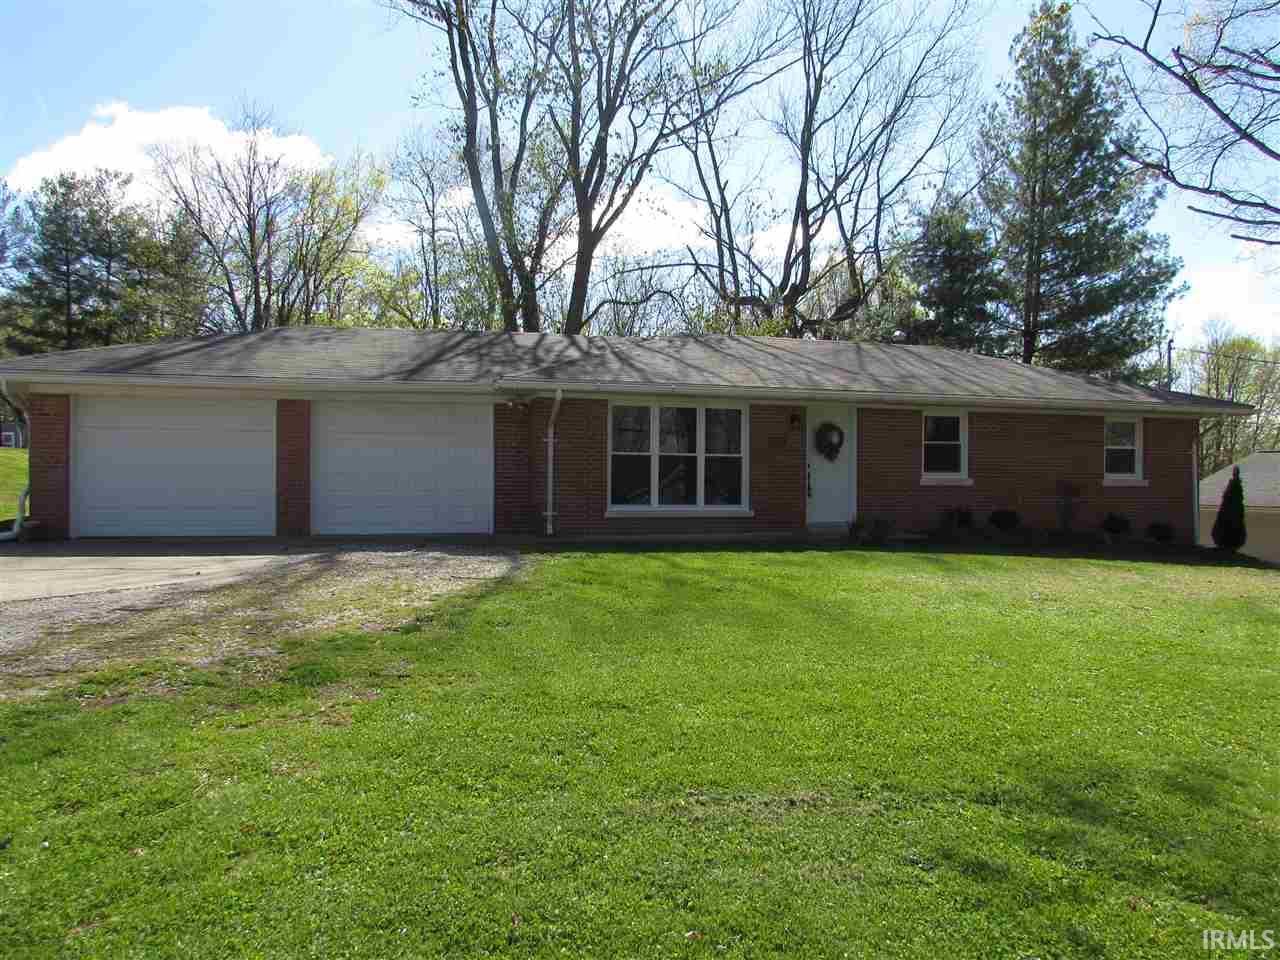 Evansville in homes for sale near west terrace school for 30 banks terrace swampscott ma